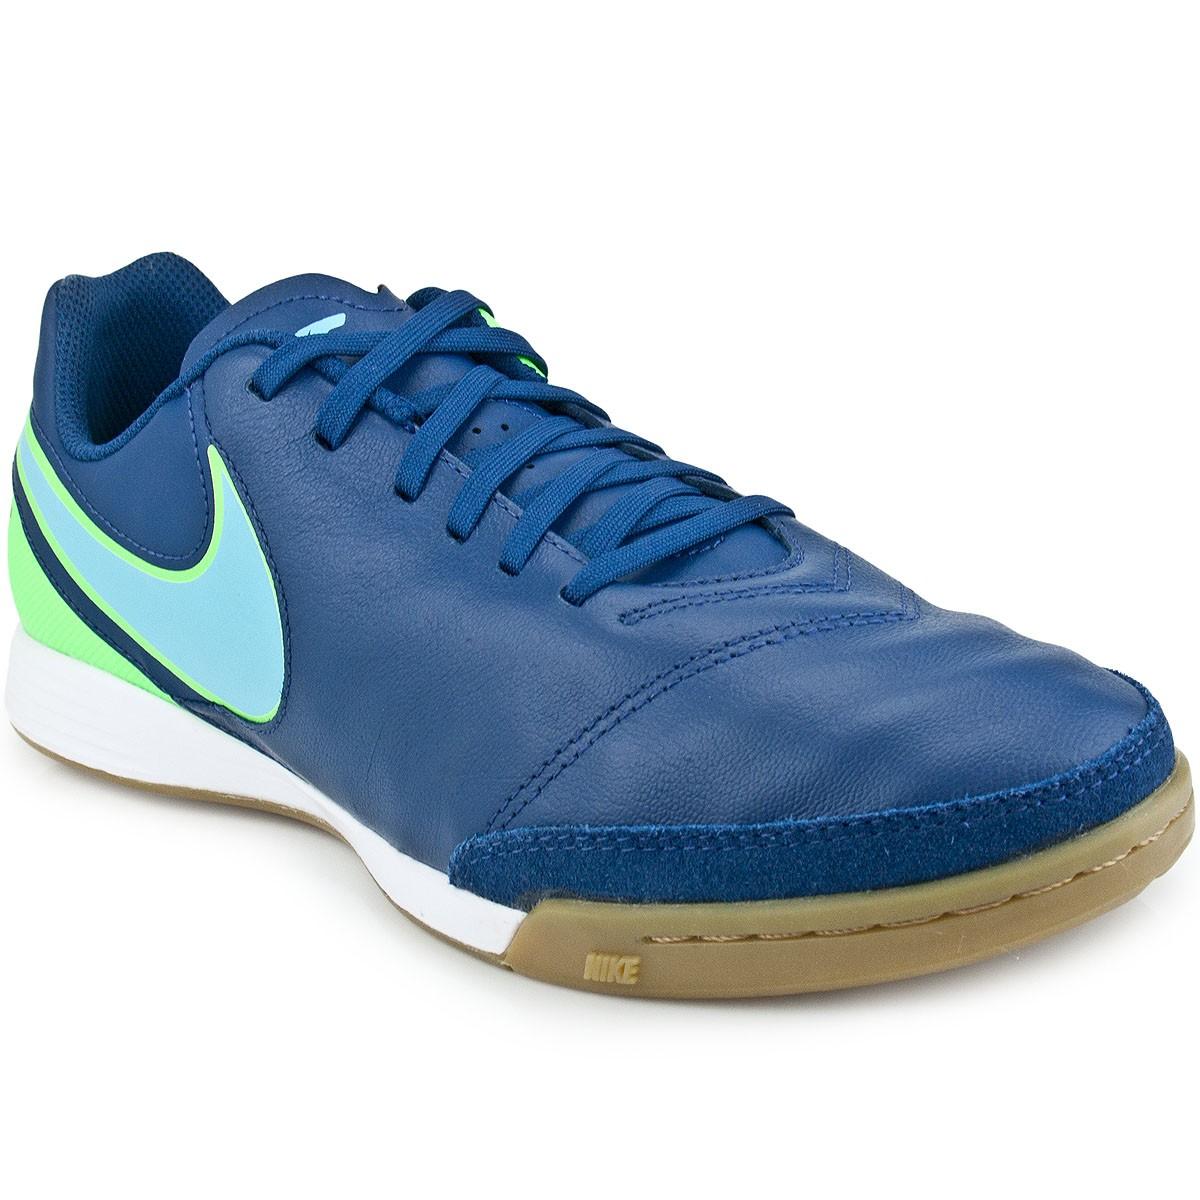 99c153c202062 Chuteira Nike Tiempo Genio II Leather IC | Futsal | MaxTennis